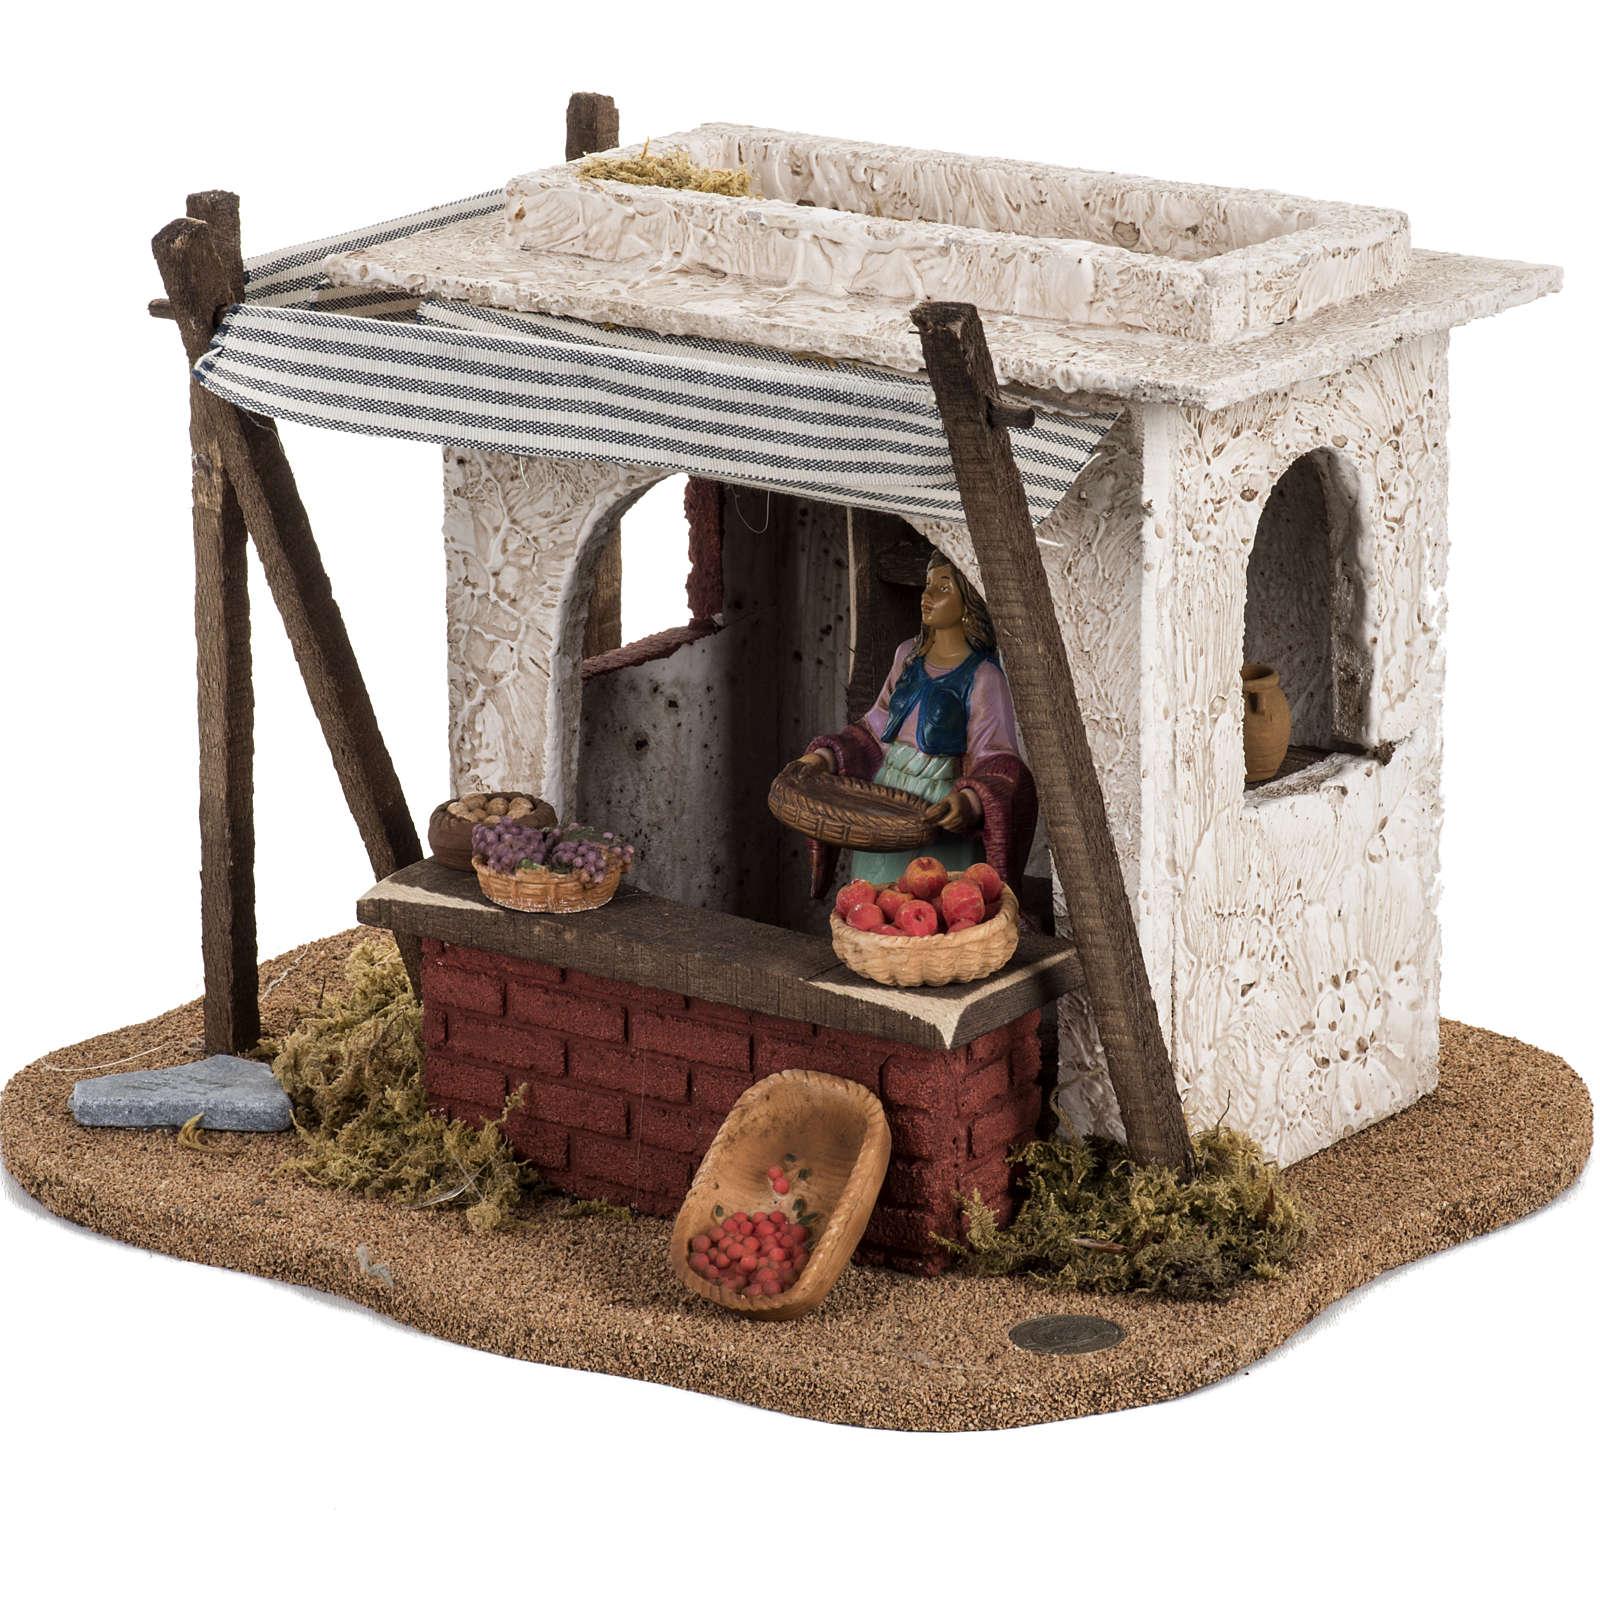 Fontanini Nativity Scene resin figurine fruits seller 12 cm 4